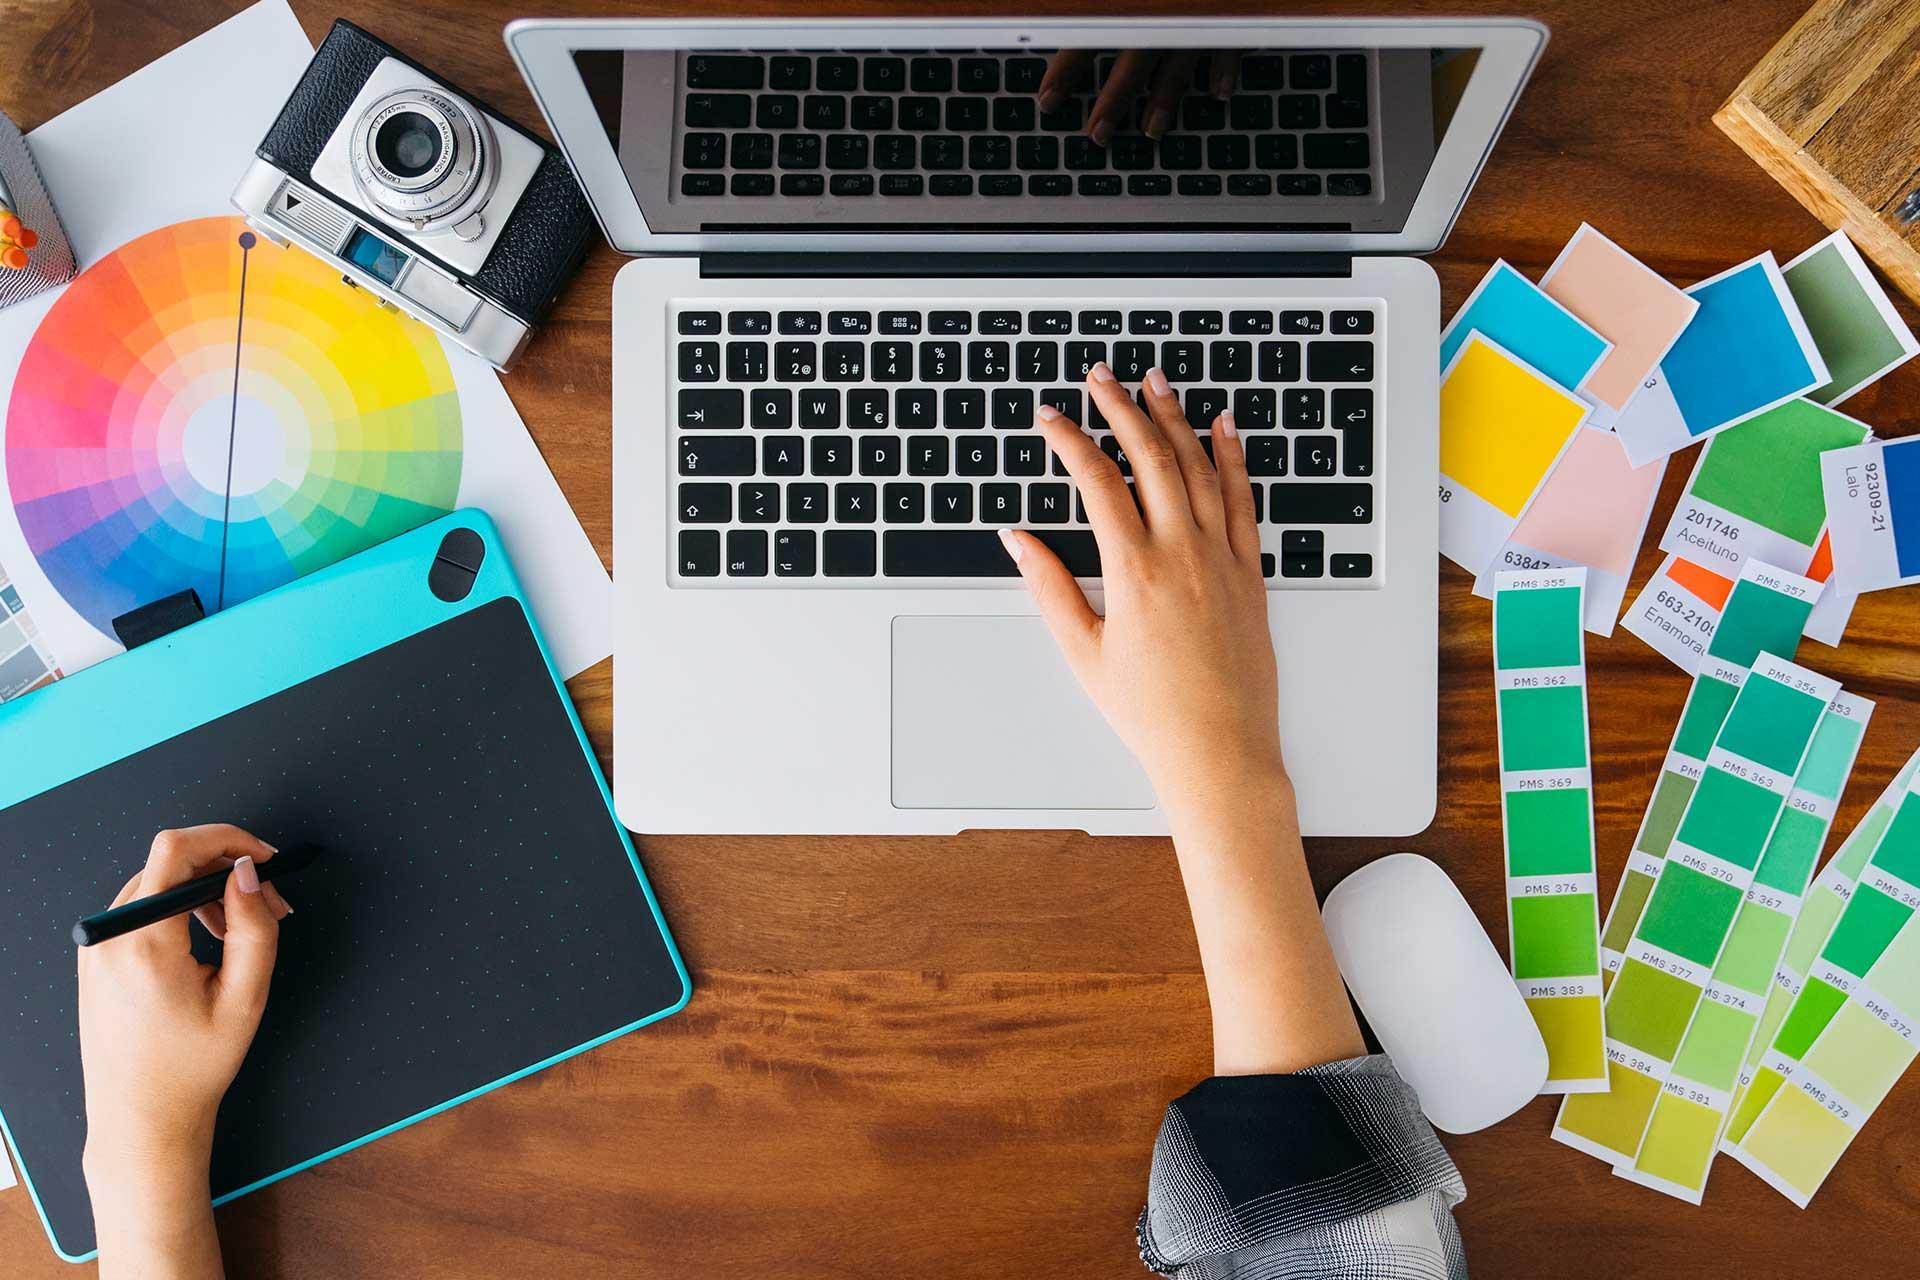 Marketing Digital Agencia Digital, Logo Design, diseno_de_logotipo_2_slider